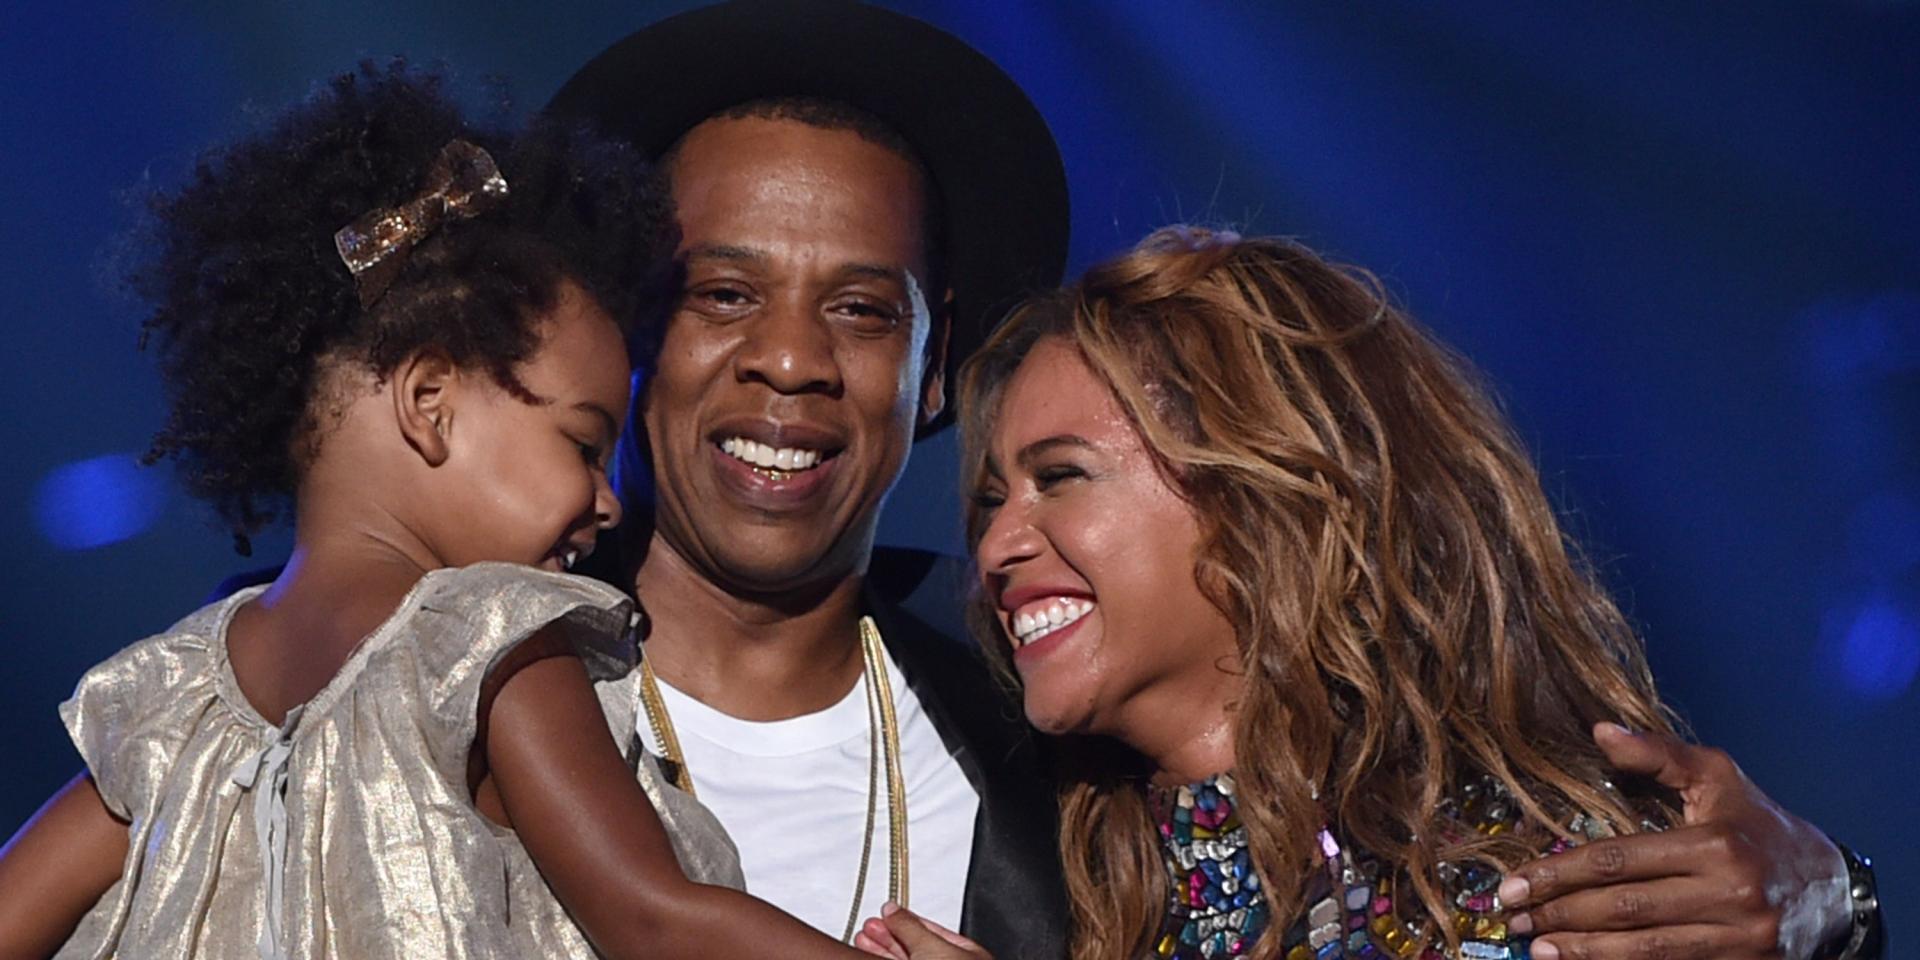 Бейонсе и Джей Зи с ребёнком